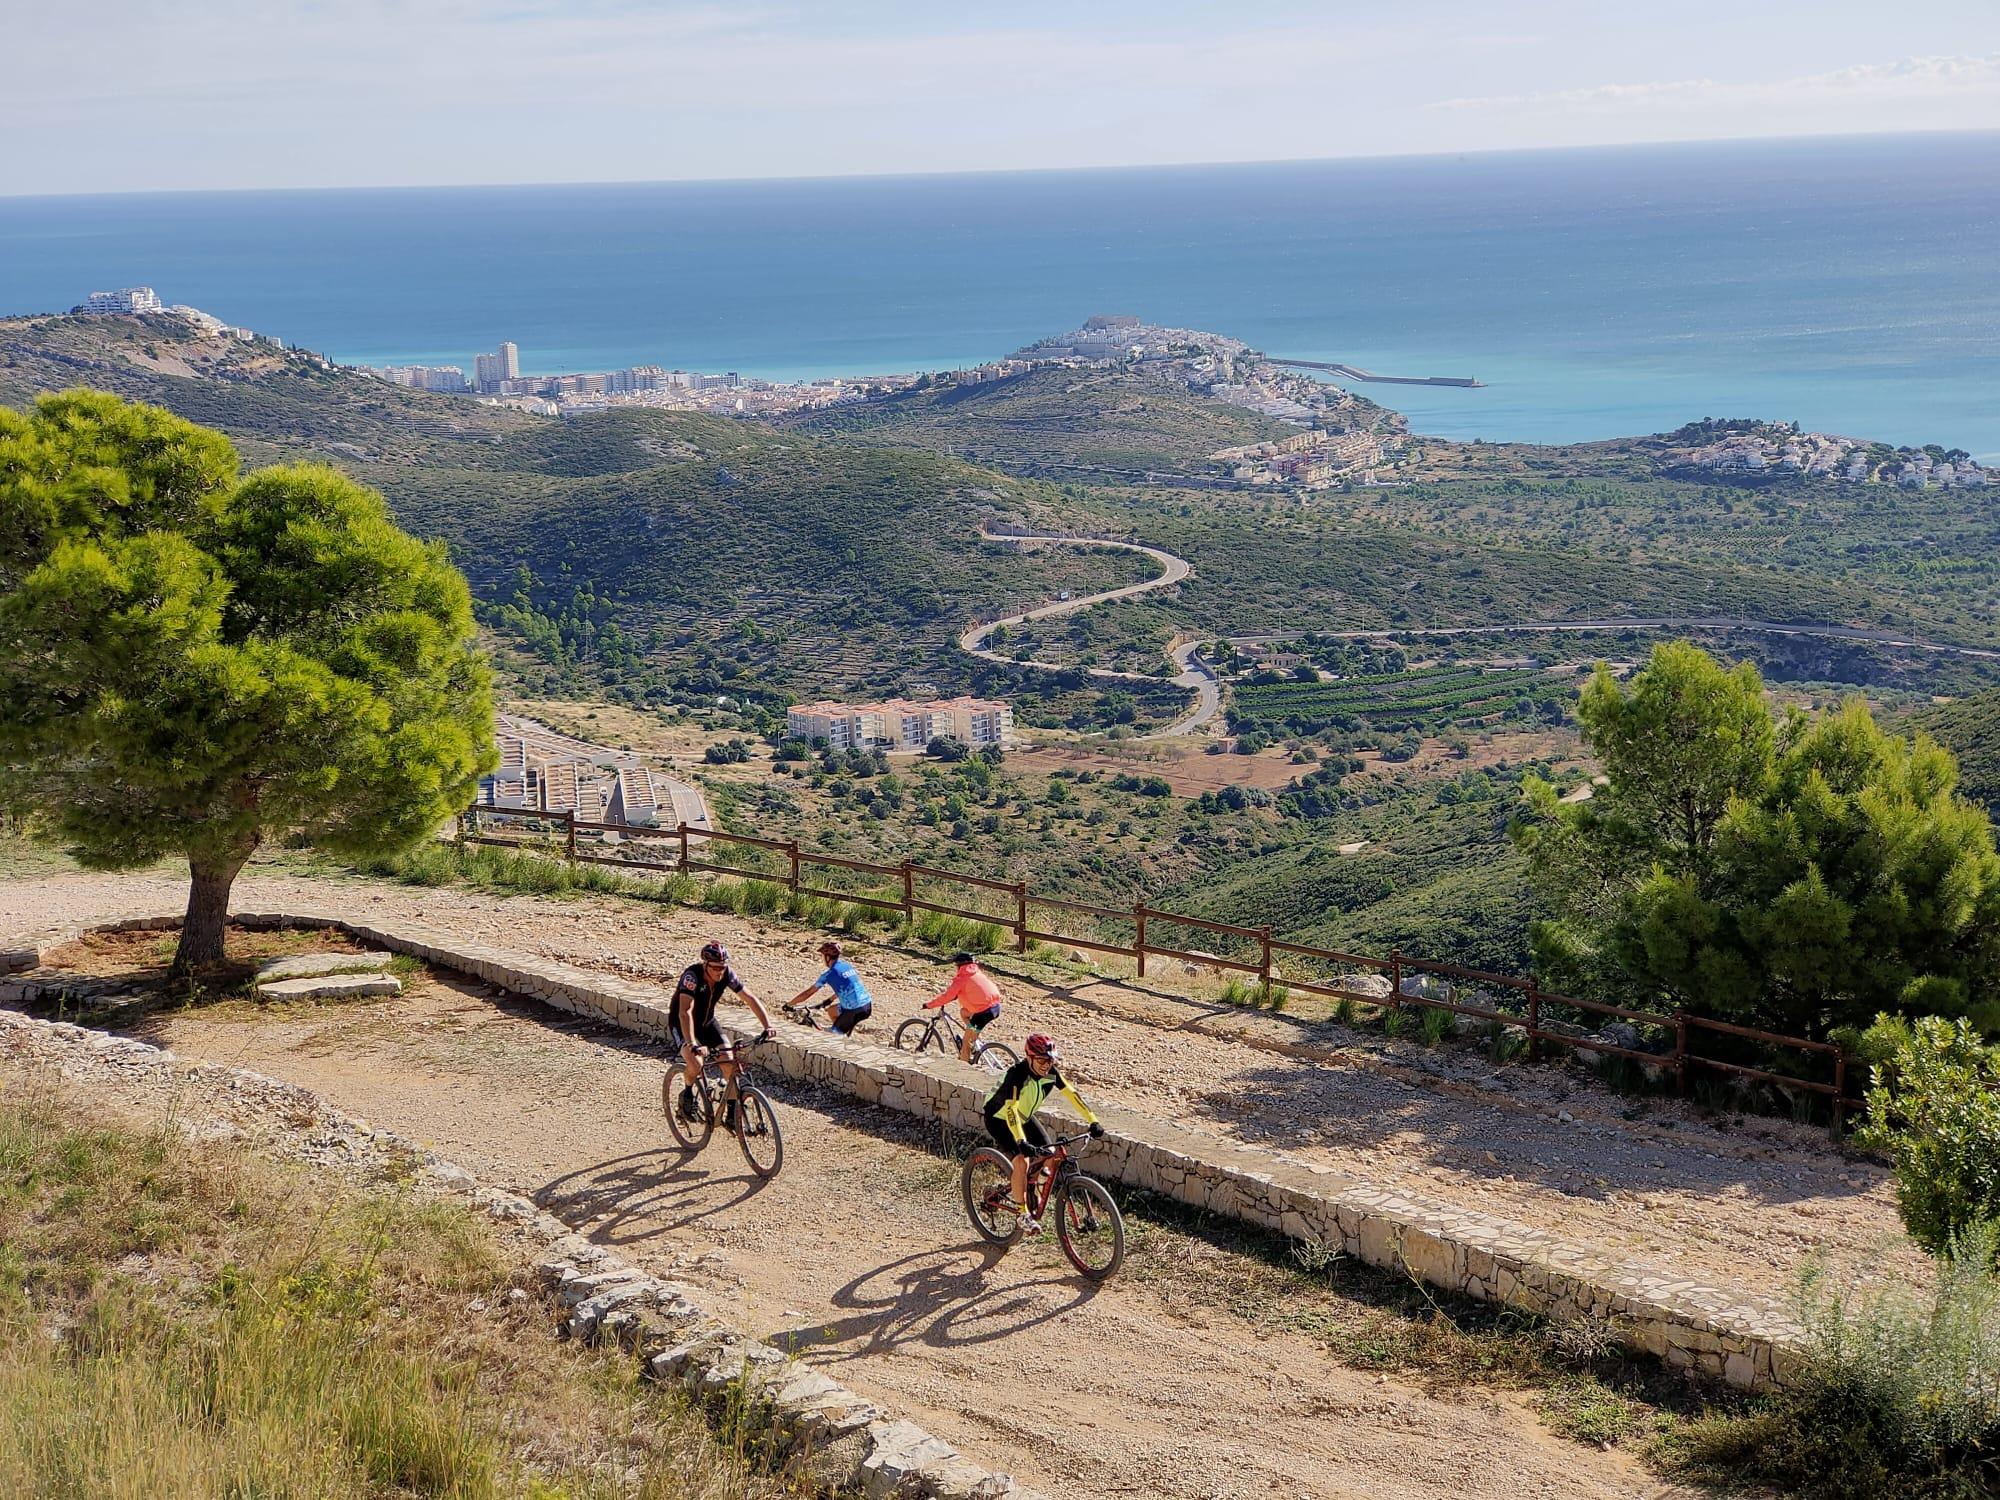 séjour_à_vélo_stage_cyclistes_espagne_vtt_mountainbike_cycling_mtb_viajes_bici_maestrat_peñíscola_peniscola_san_antonio